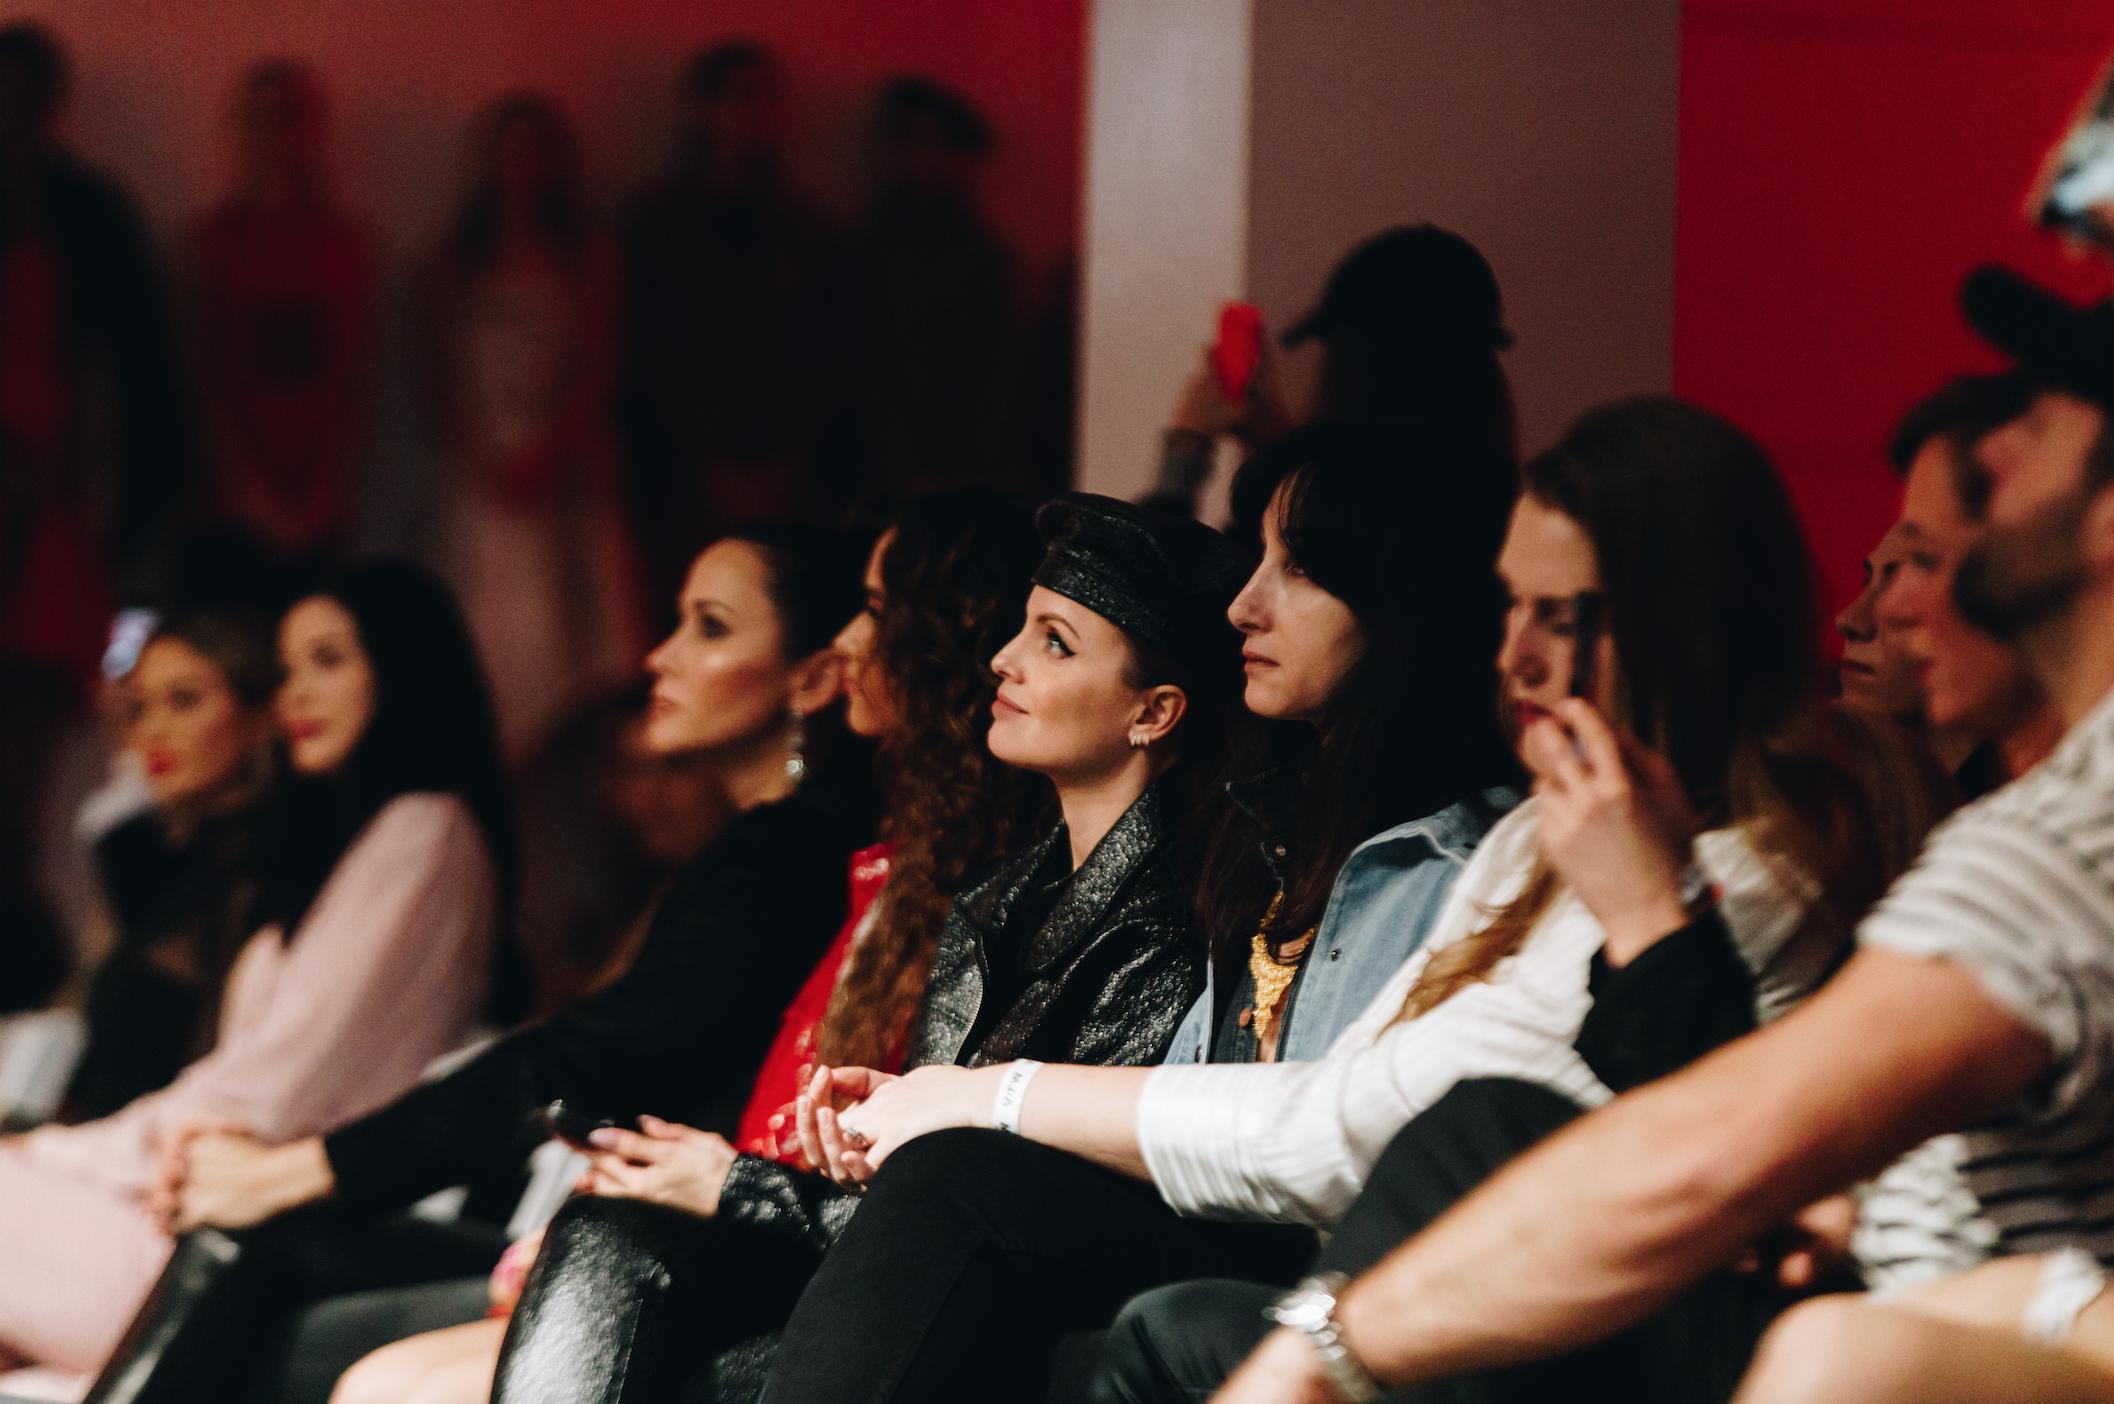 Mena Suvari at Vegan Fashion Week